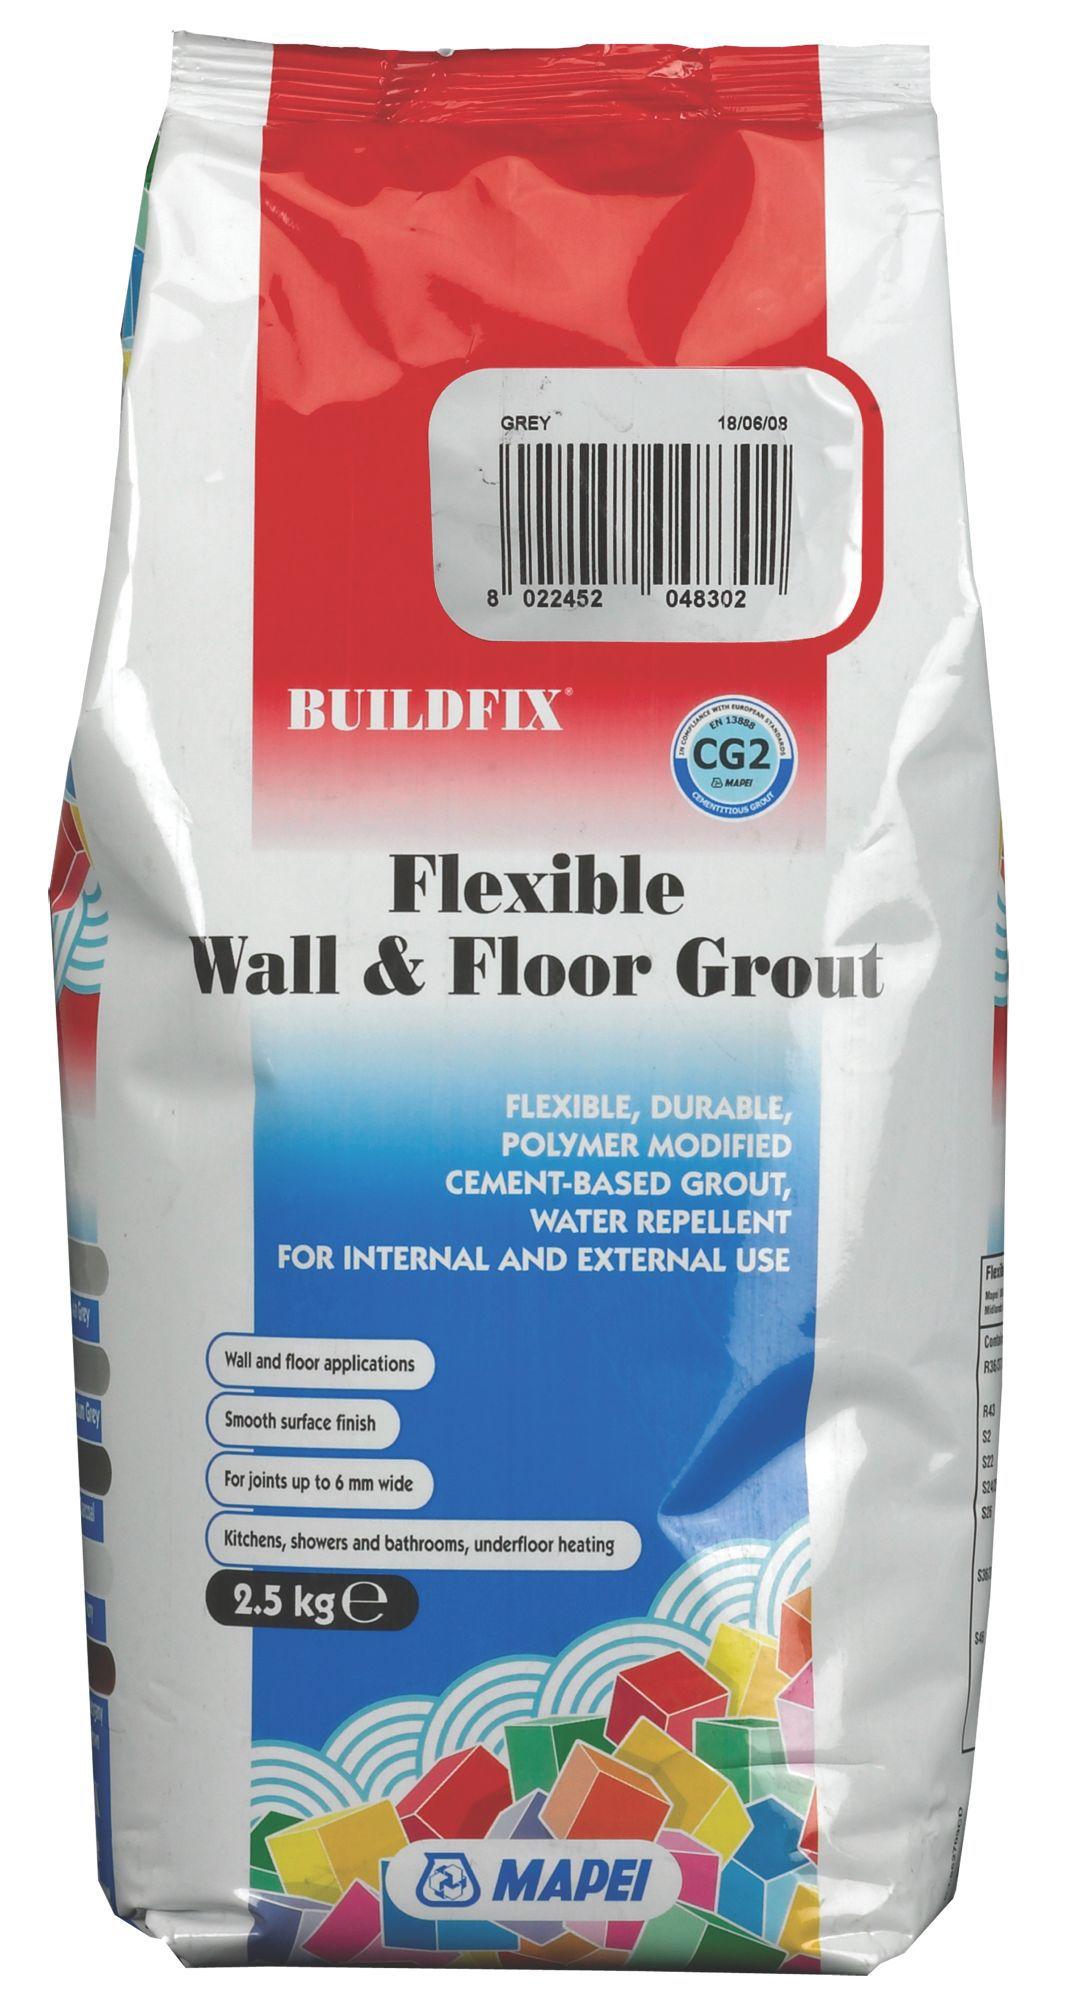 Mapei flexible grey wall floor grout w25kg departments mapei flexible grey wall floor grout w25kg departments diy at bq dailygadgetfo Choice Image